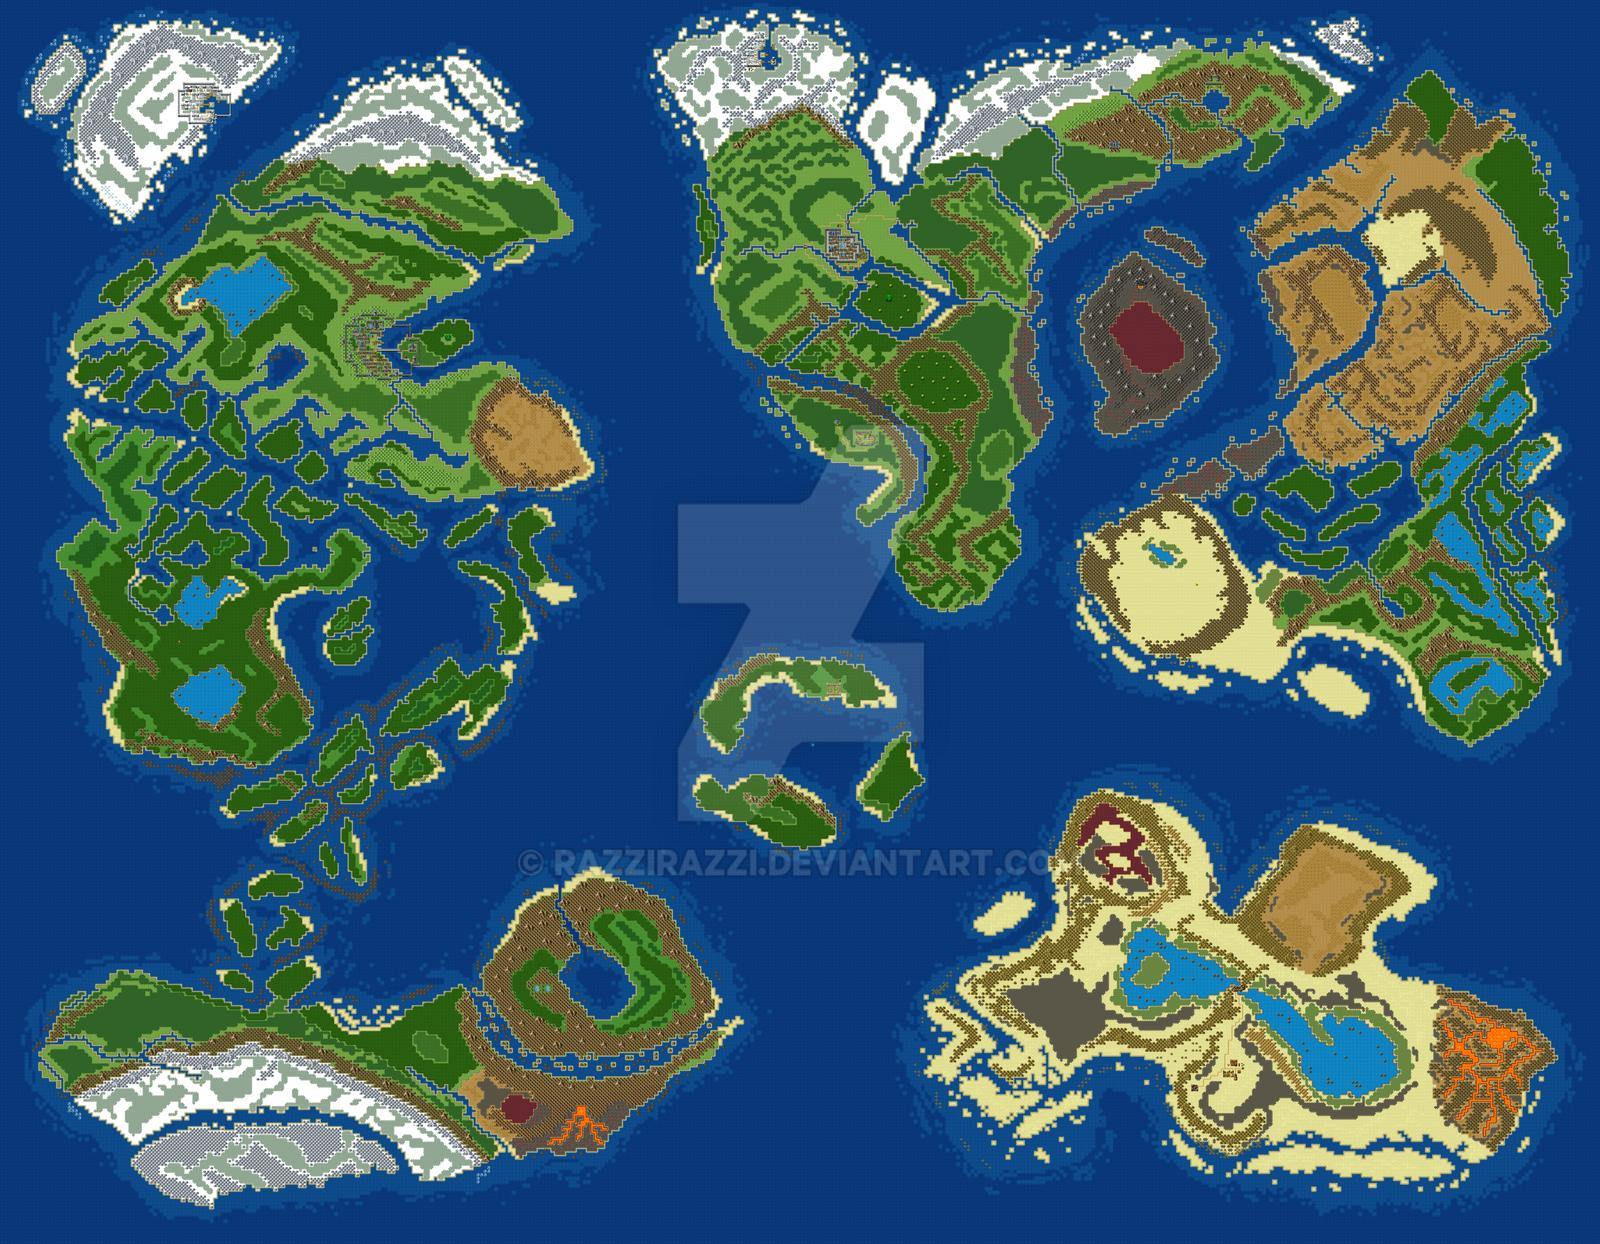 World map v6 by razzirazzi on deviantart world map v6 by razzirazzi world map v6 by razzirazzi gumiabroncs Image collections